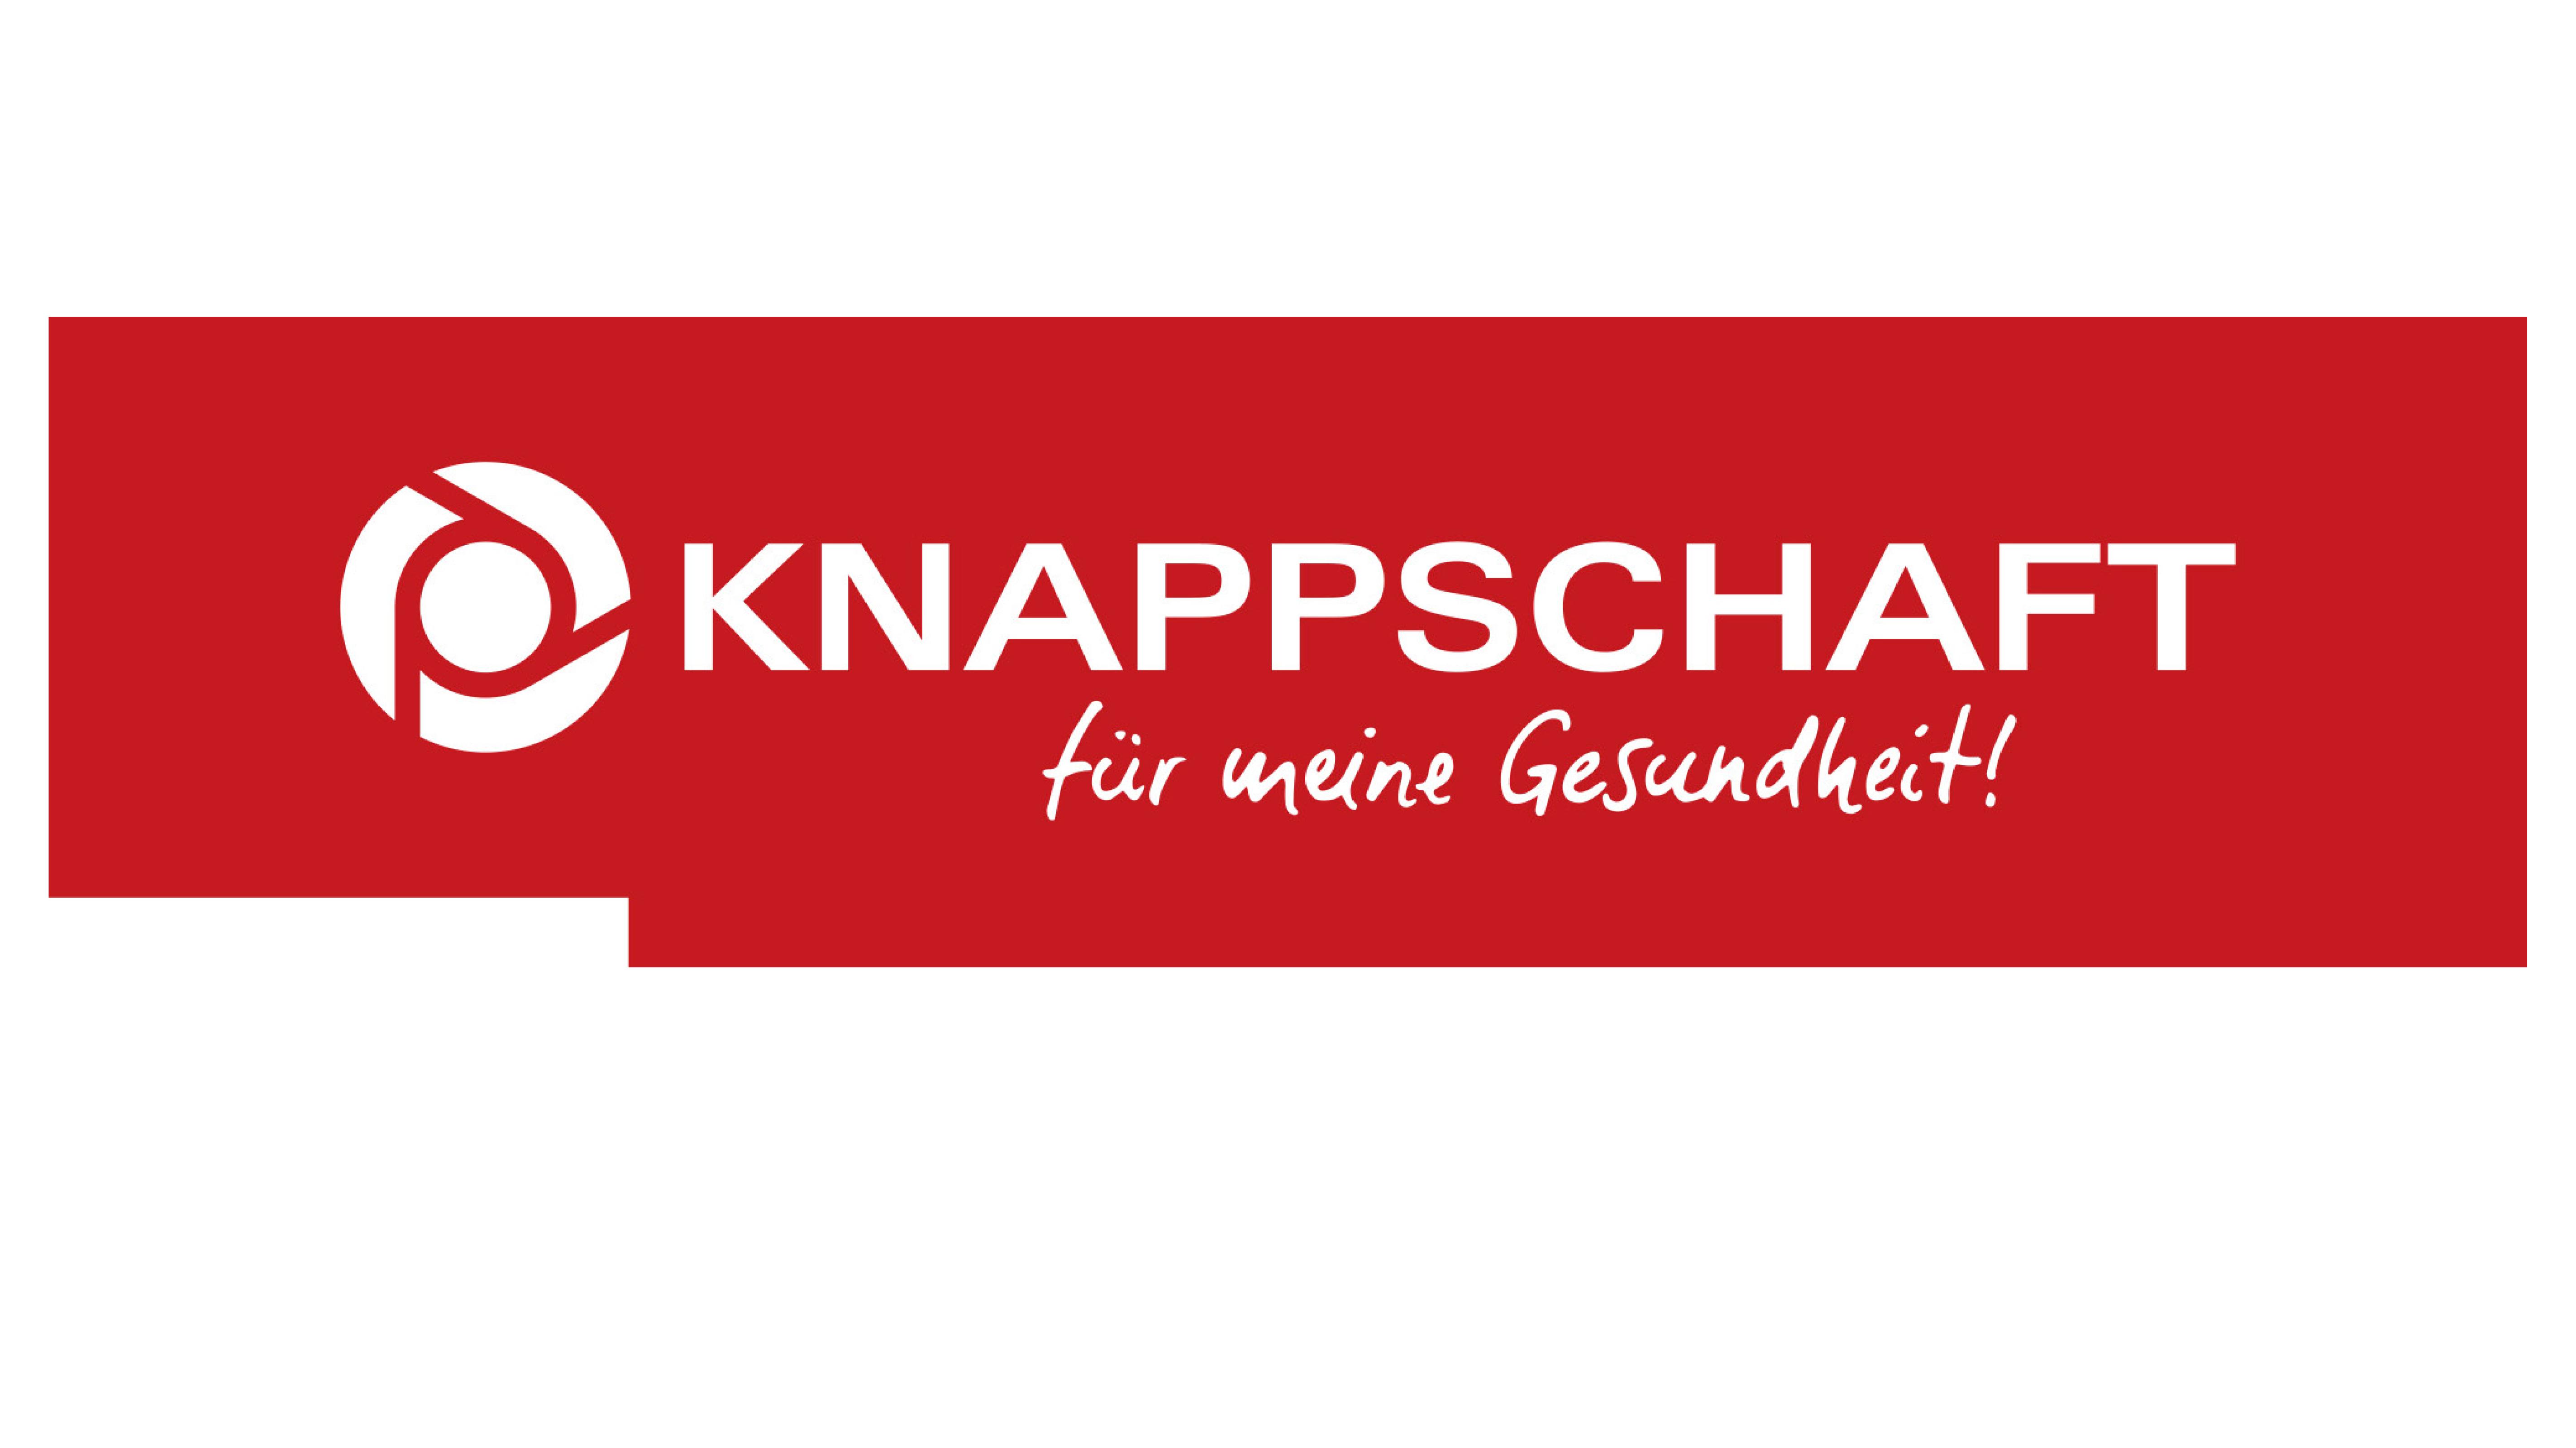 Knappschaft-Label